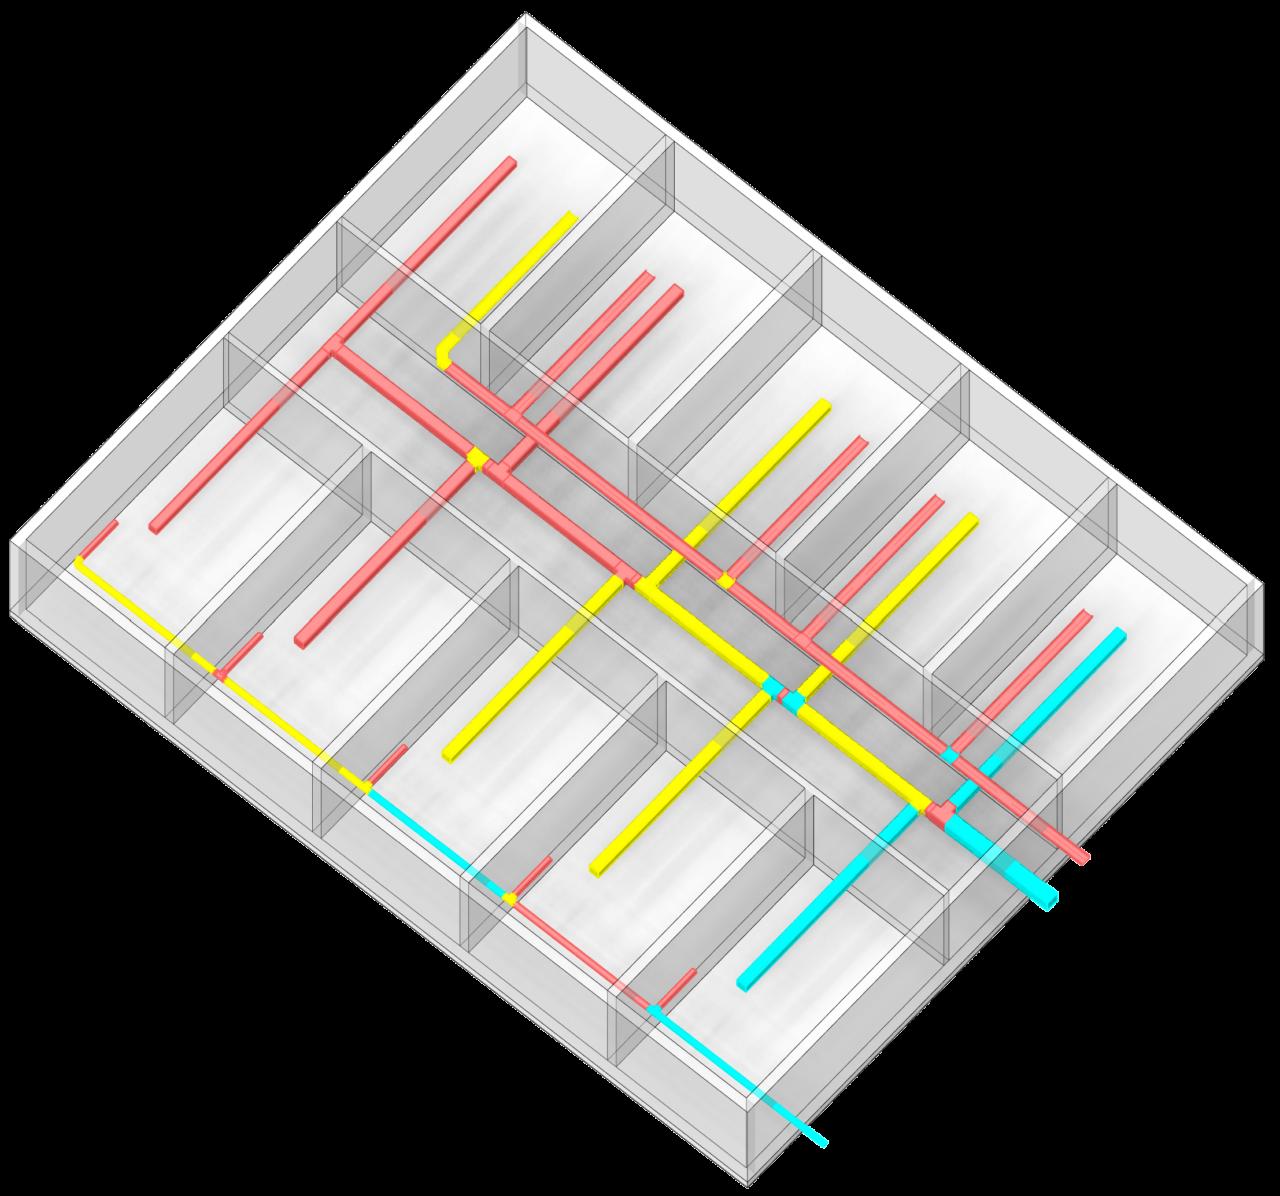 ChangeDuct_PipeFittingLevel - Modify fitting levels without